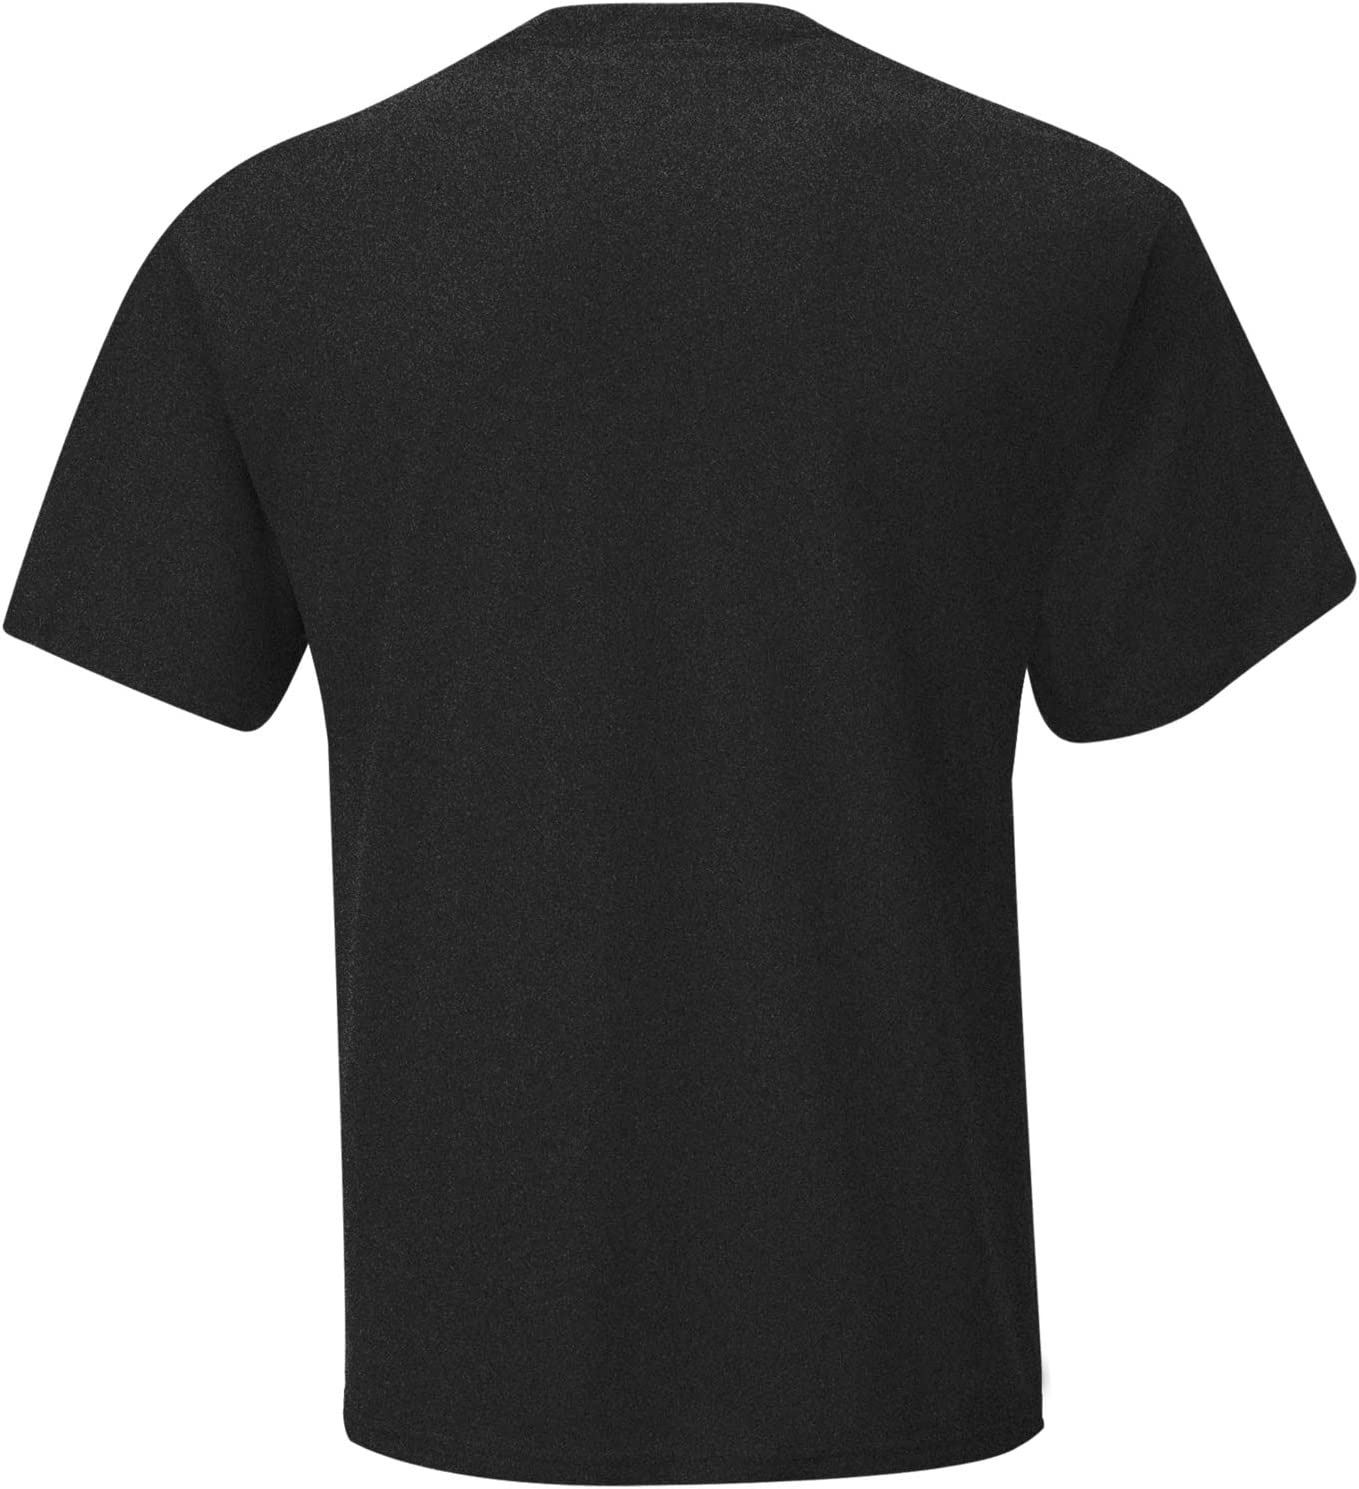 Checkered Flag NASCAR Joey Logano #22 1 Spot Victory T-Shirt